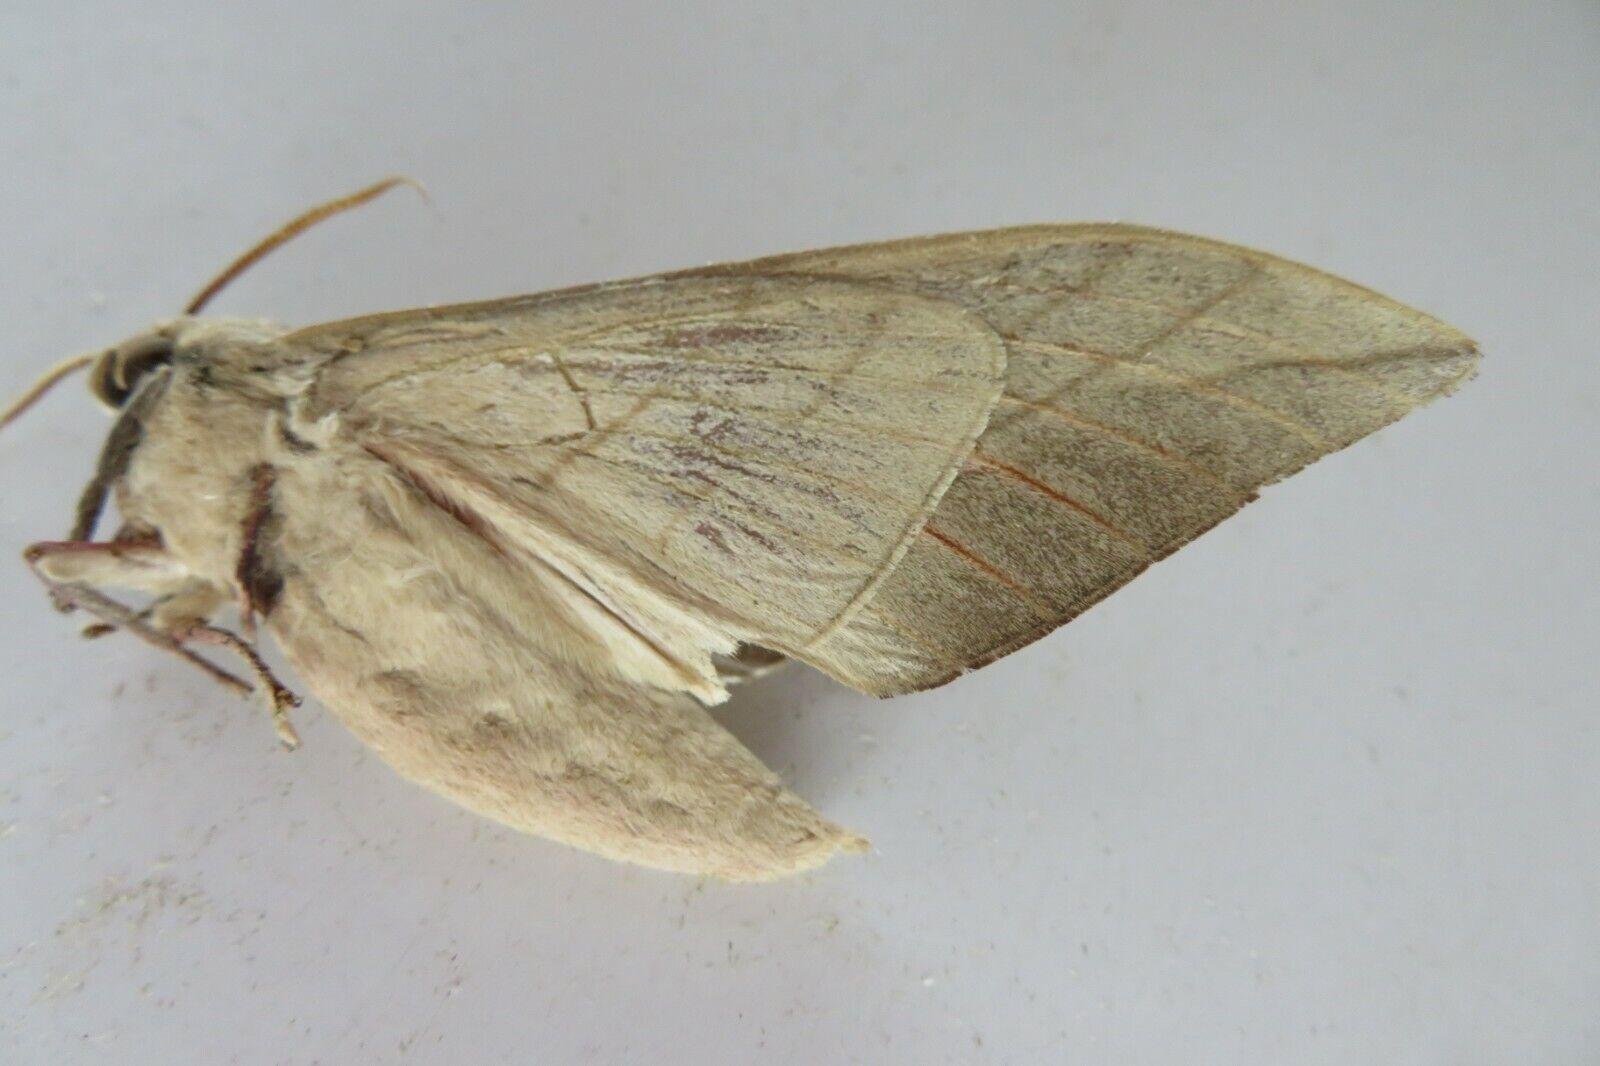 Sp6844 Insects moths Sphingidae Rhodambulyx sp Vietnam Lam Dong